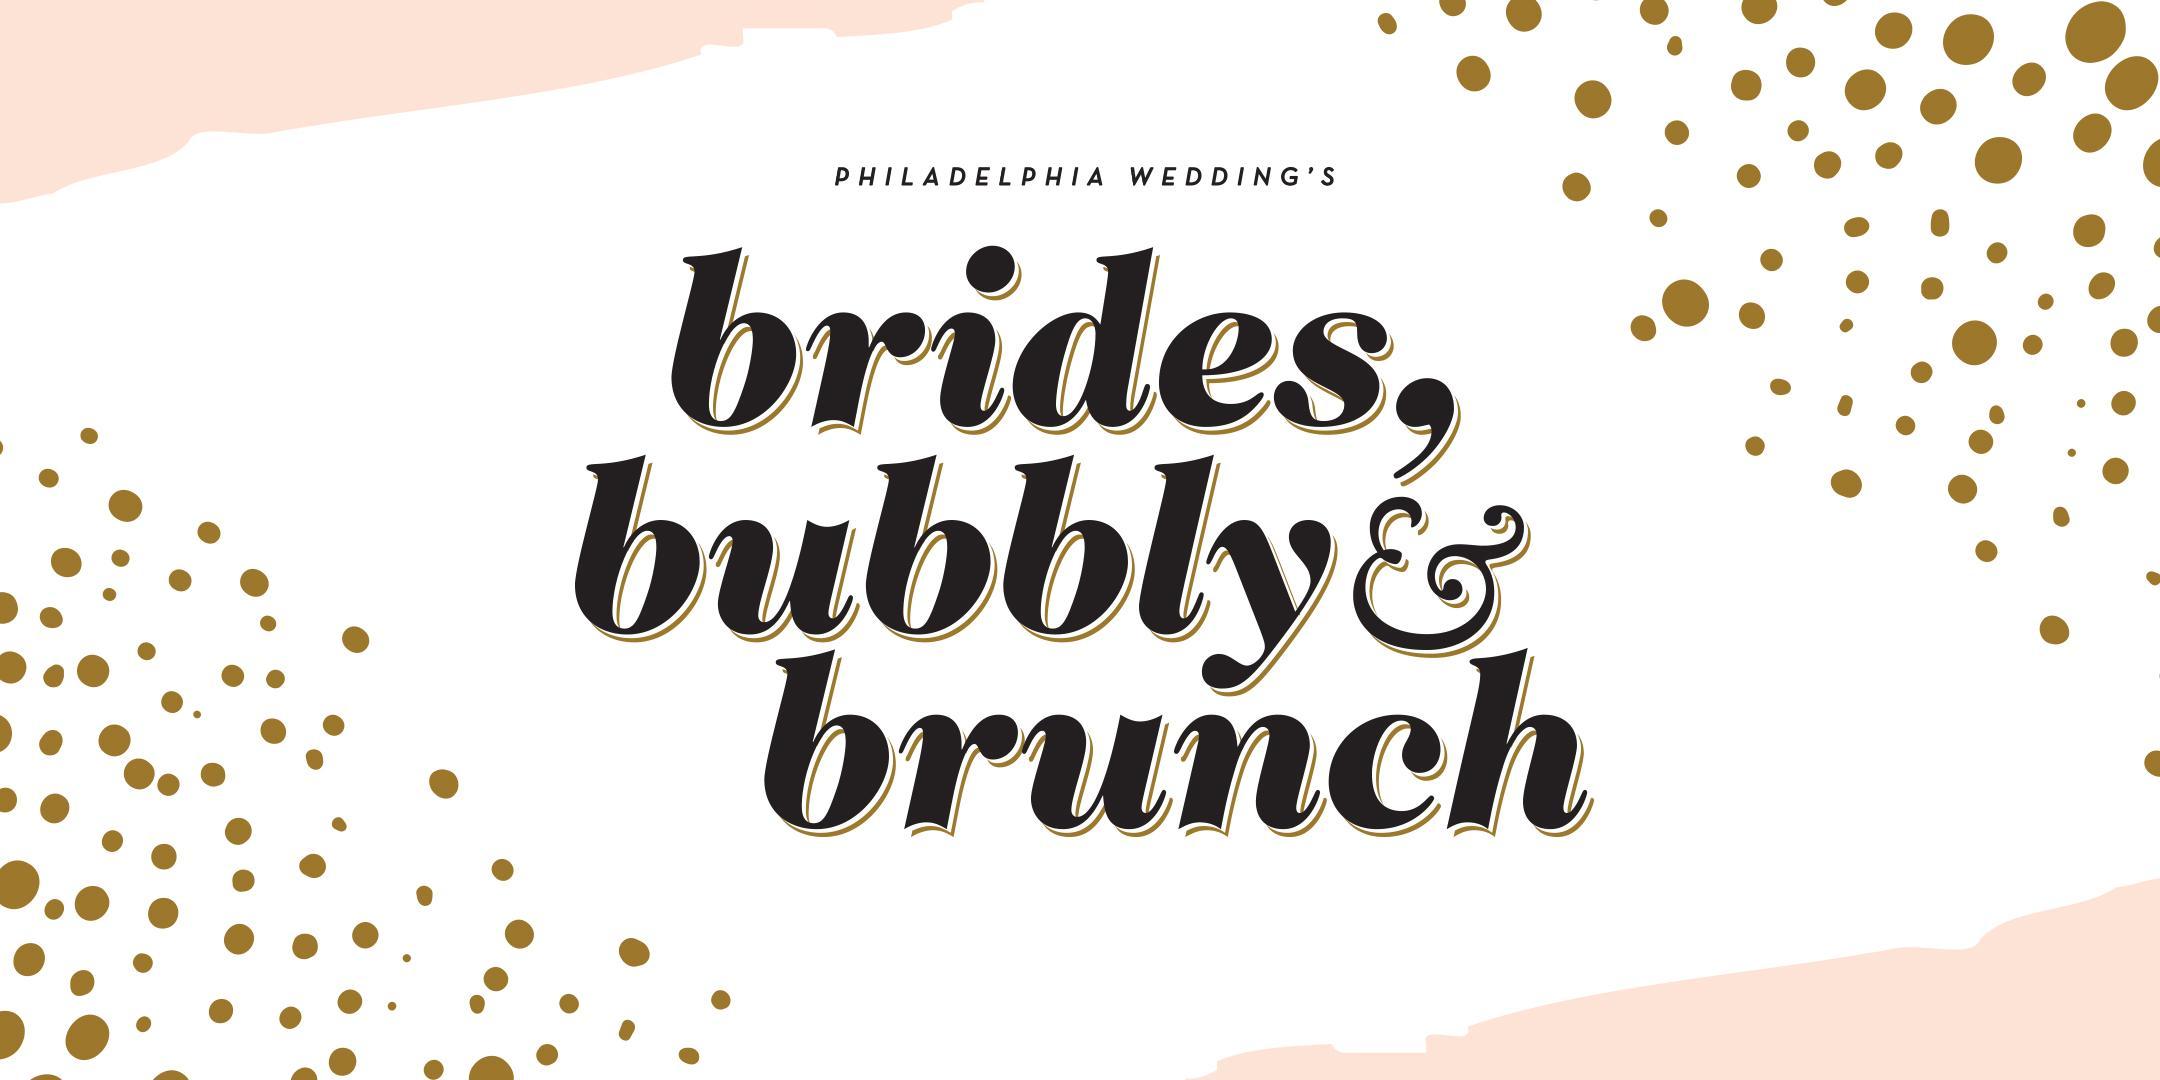 Philadelphia Wedding's Brides, Bubbly & Brunc